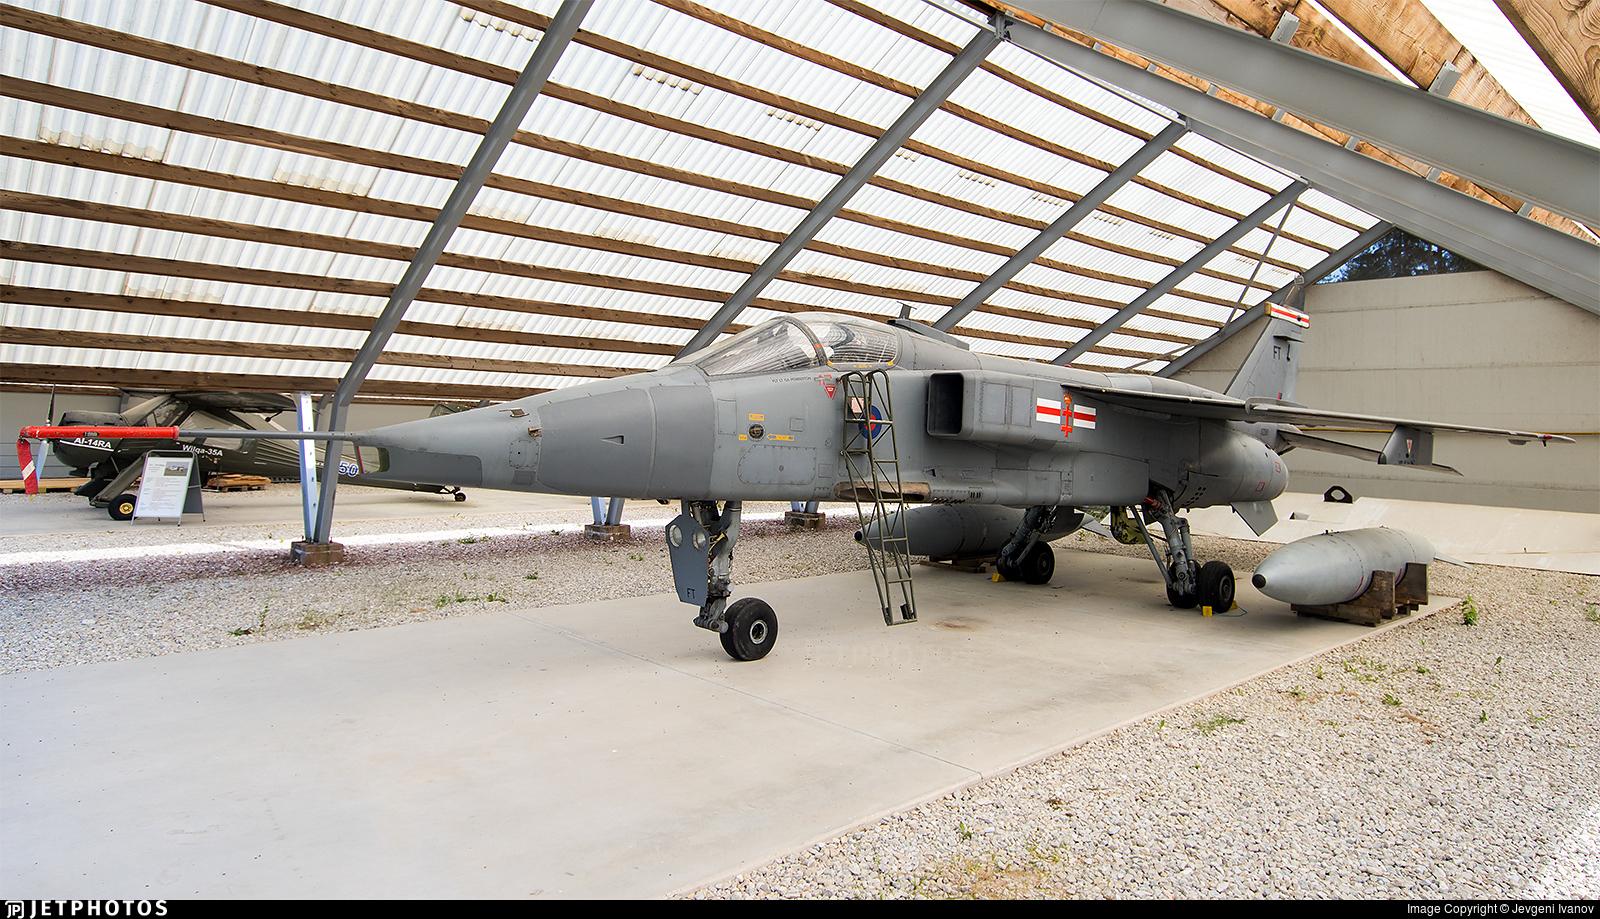 XZ361 - Sepecat Jaguar GR.3 - United Kingdom - Royal Air Force (RAF)